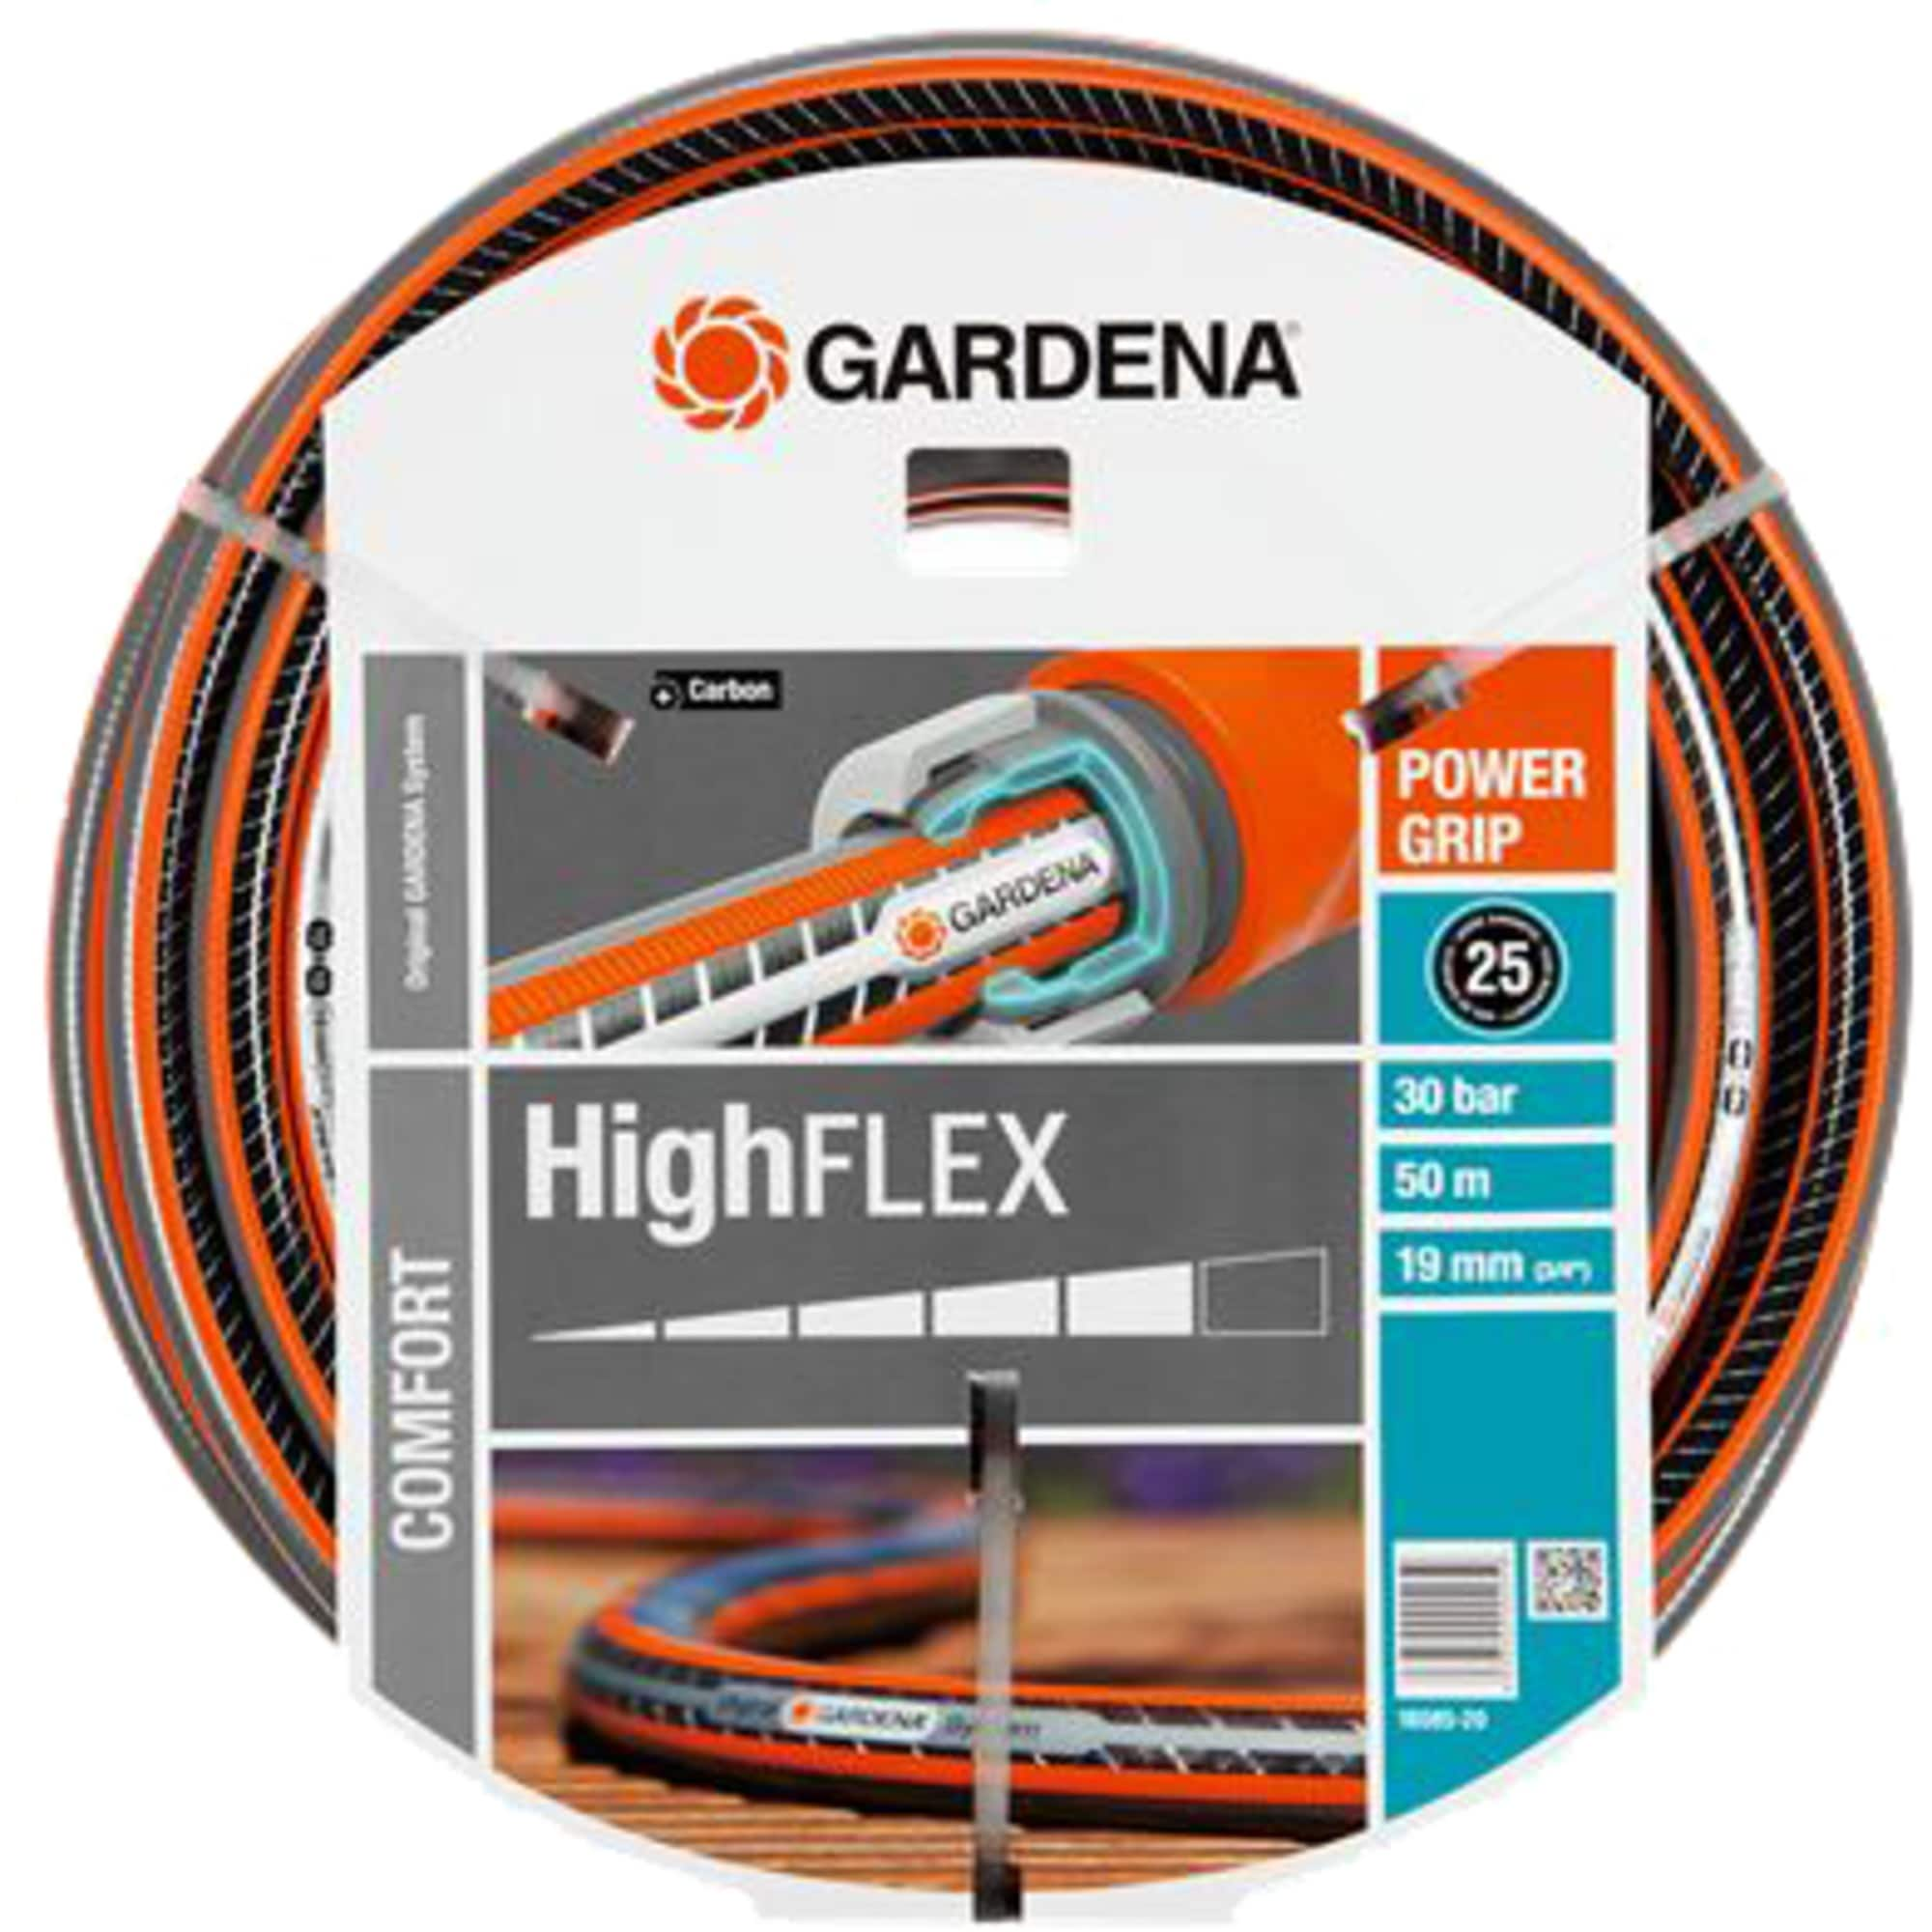 "Gardena Comfort HighFLEX Schlauch 19mm (3/4"")"